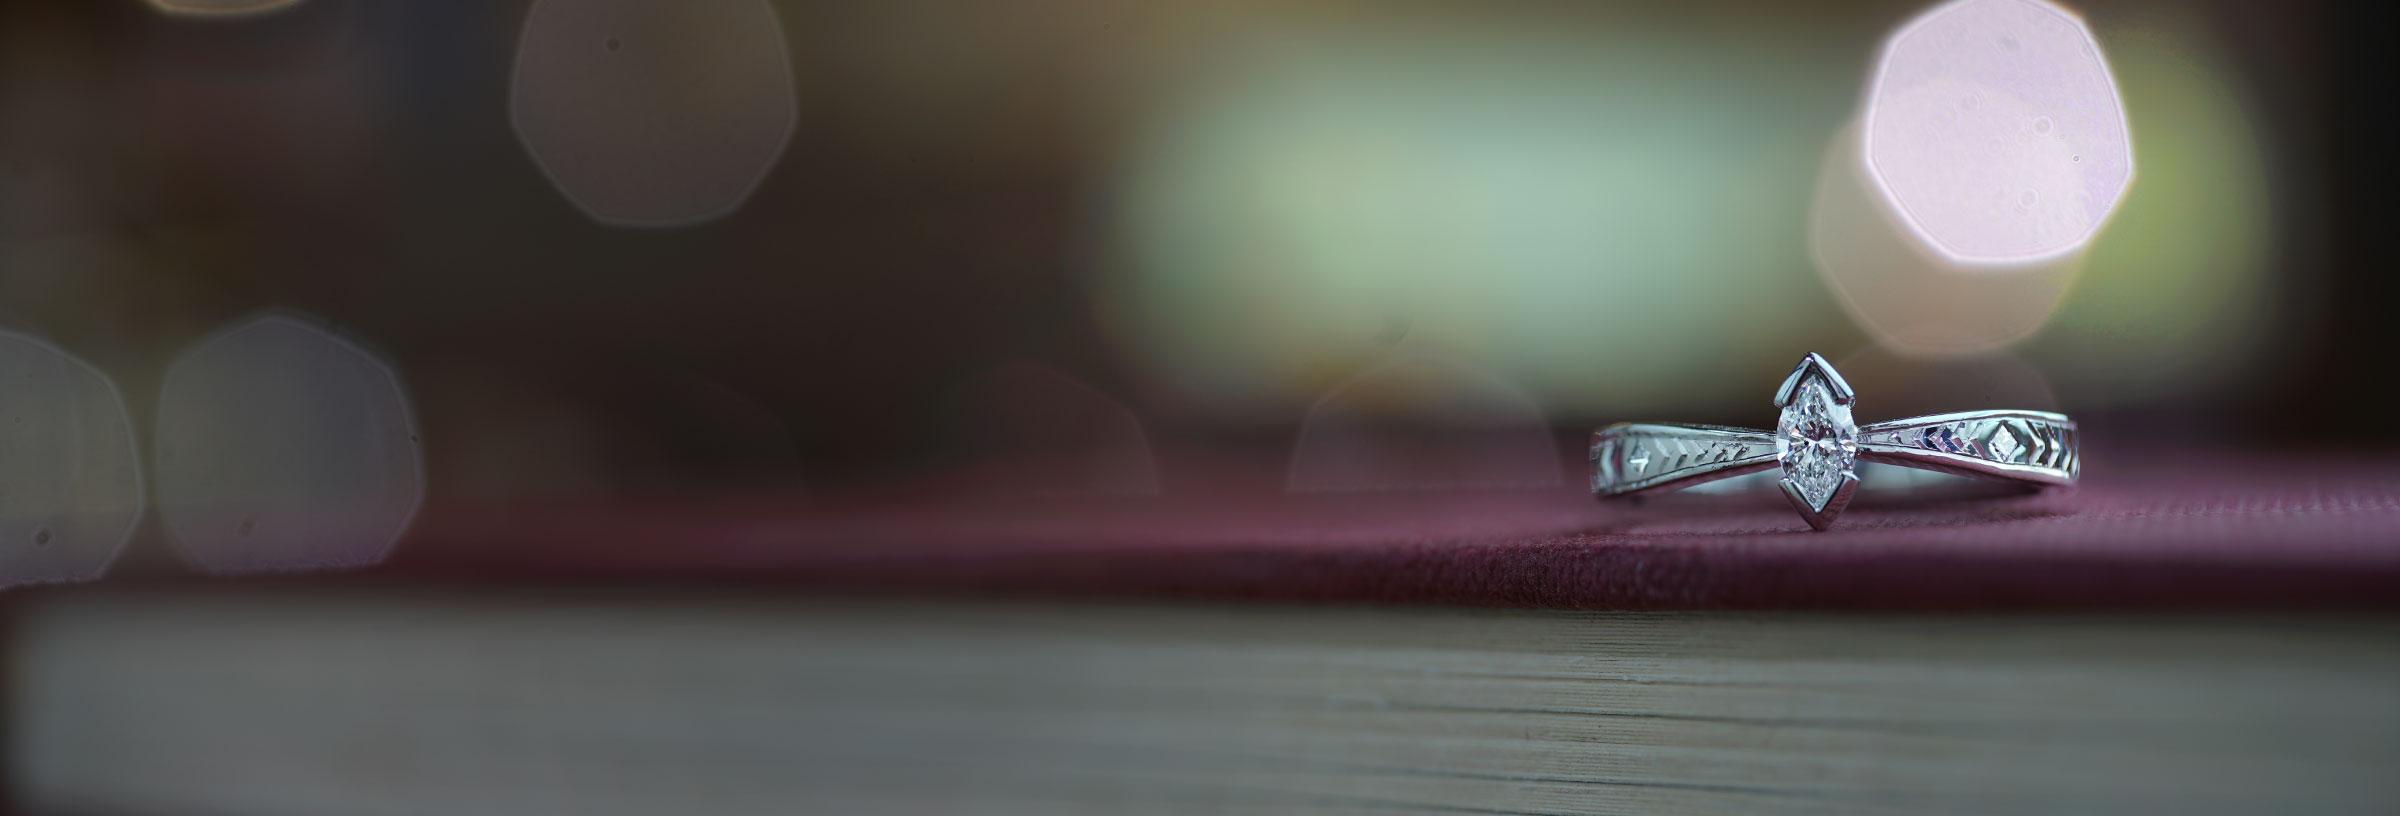 palladium-ring-with-marquise-diamond-and-chevron-engraving